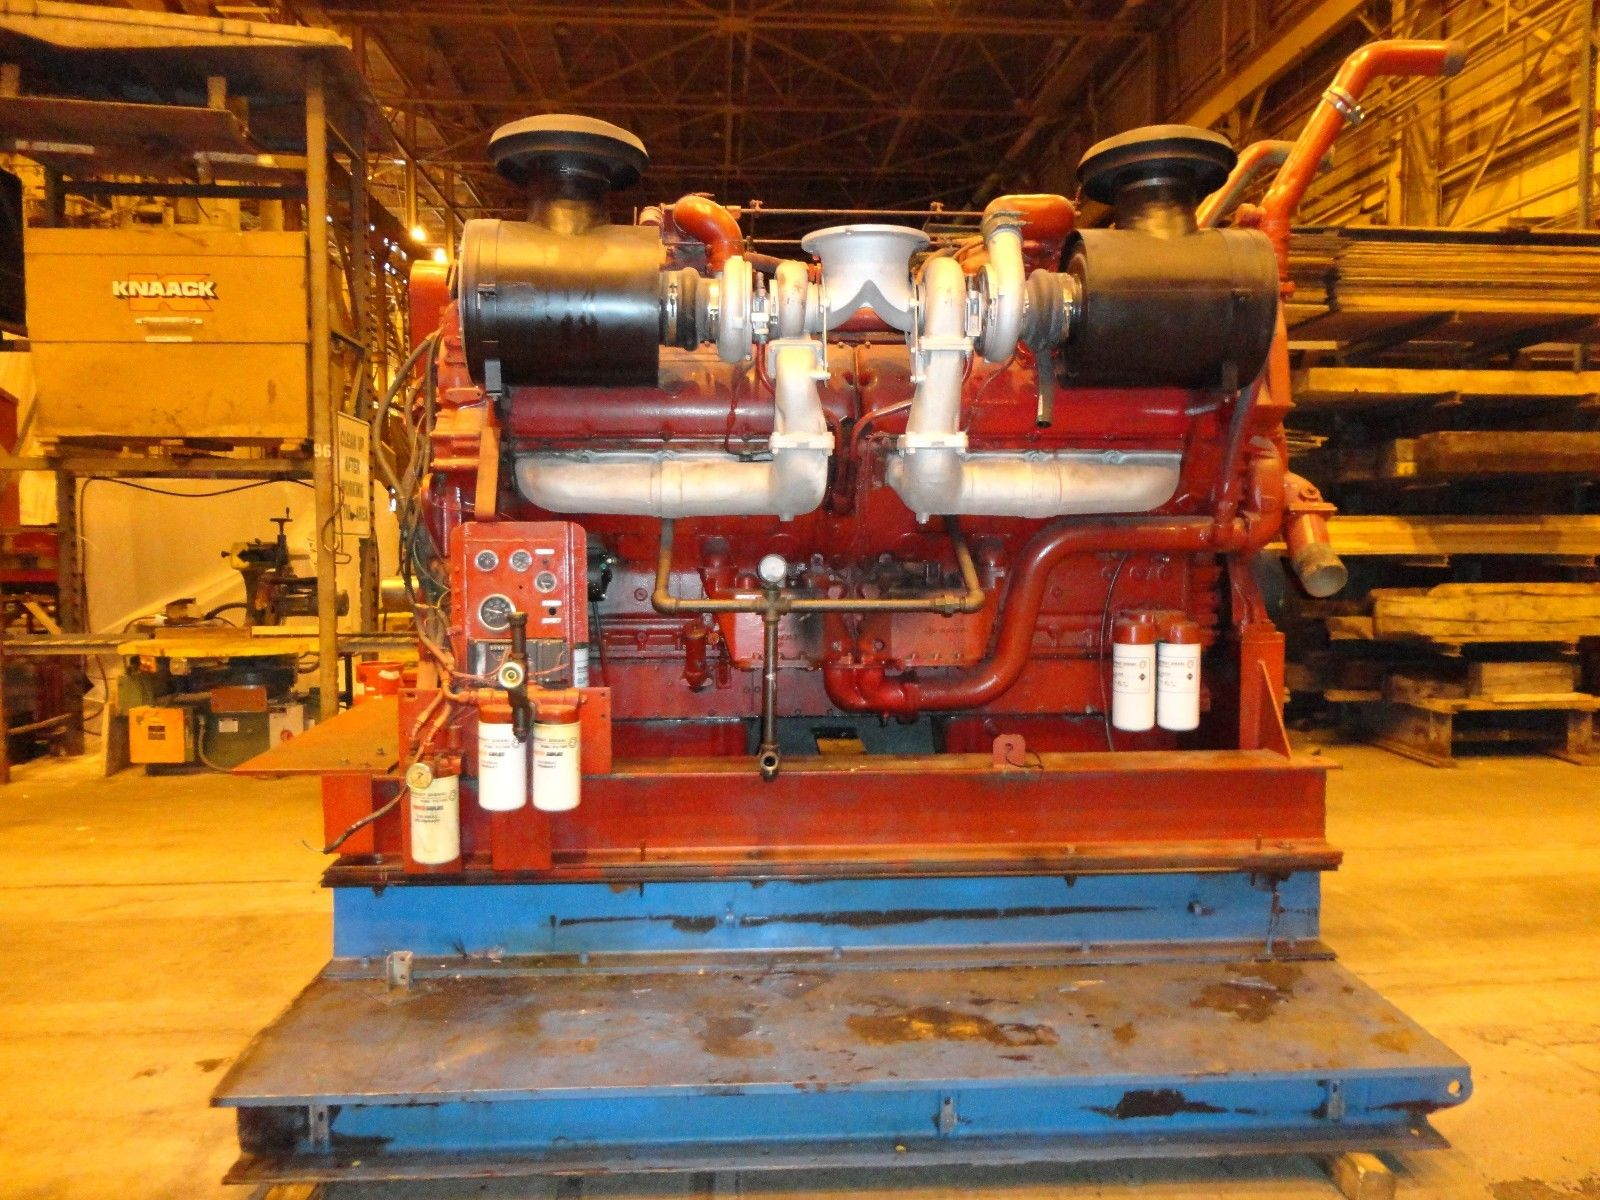 Detroit Diesel 16v 149 Manual